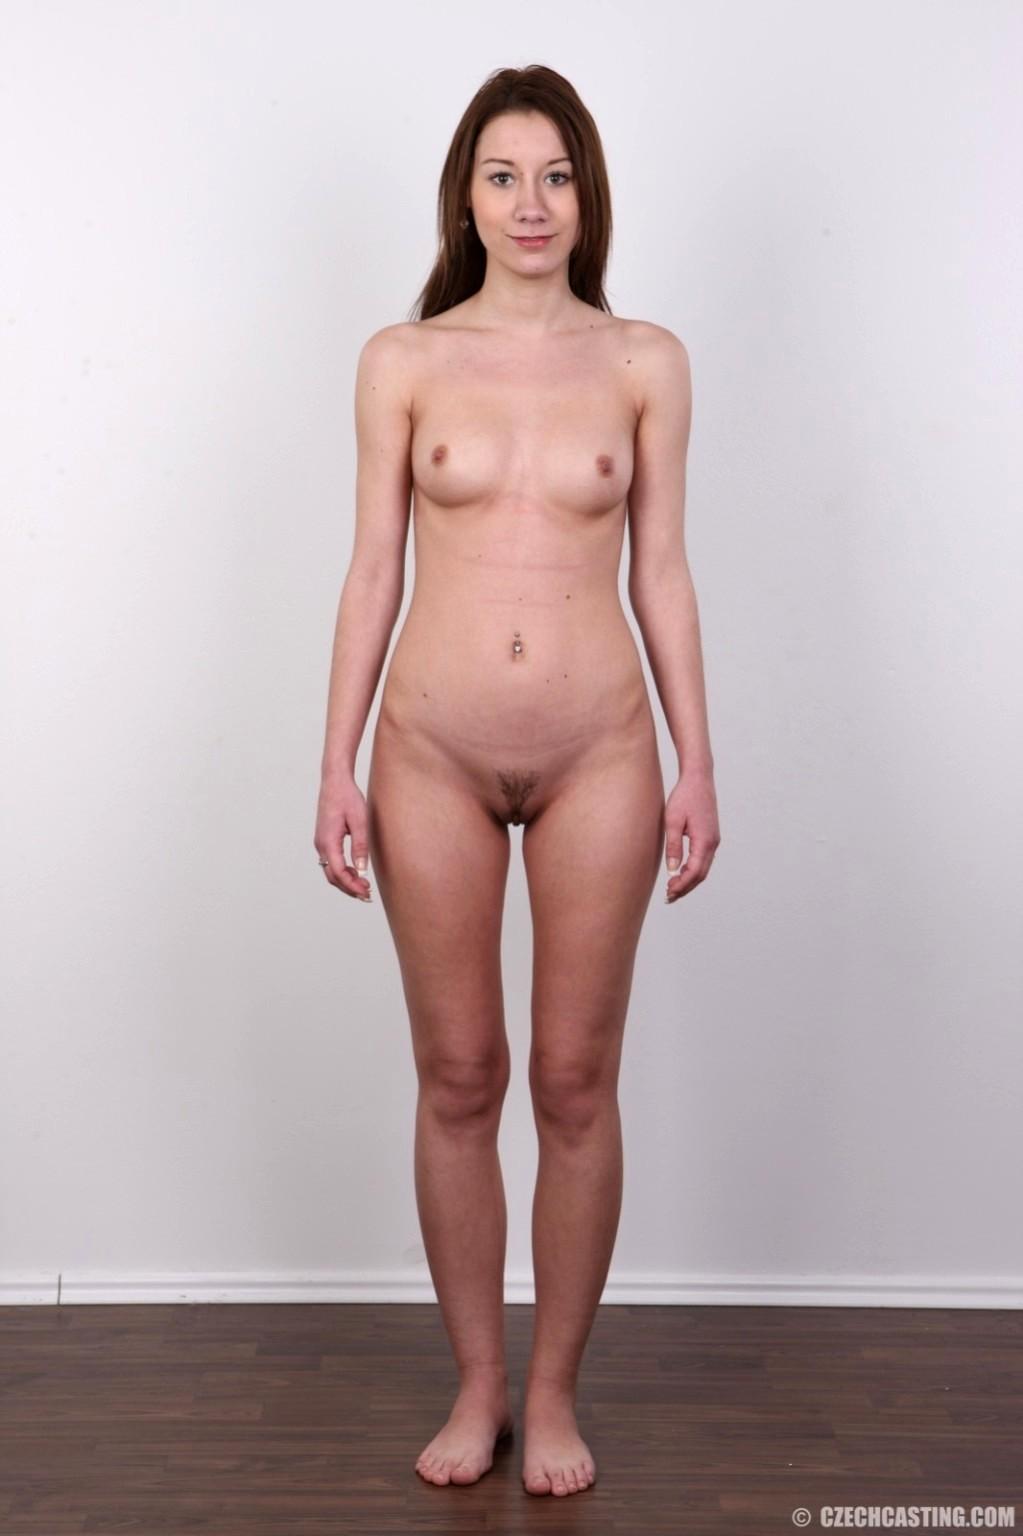 girls masterbating with dildos gif